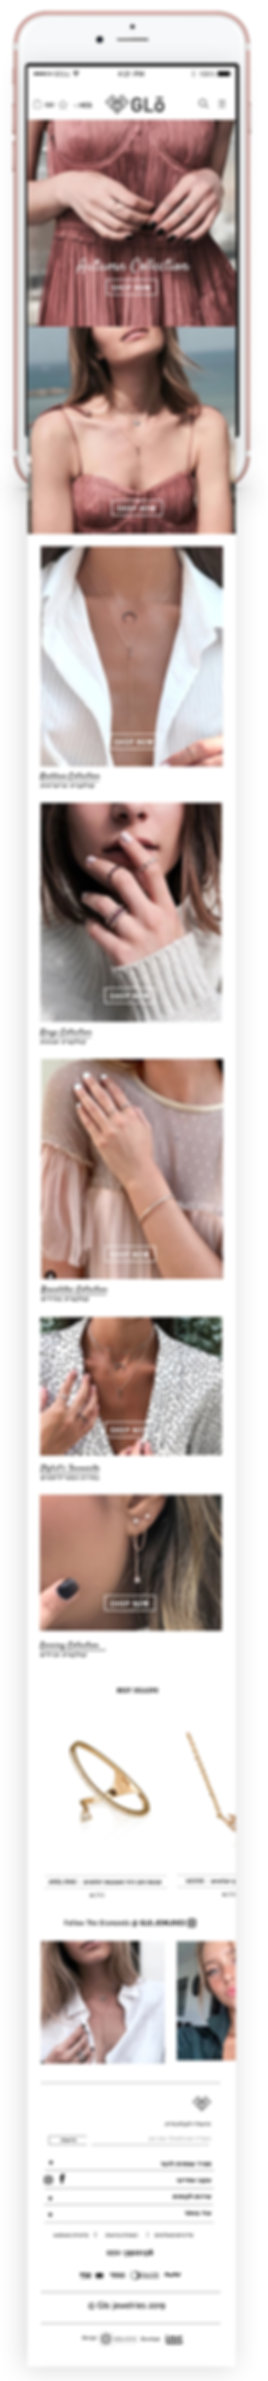 glo-mobile-homepage.jpg